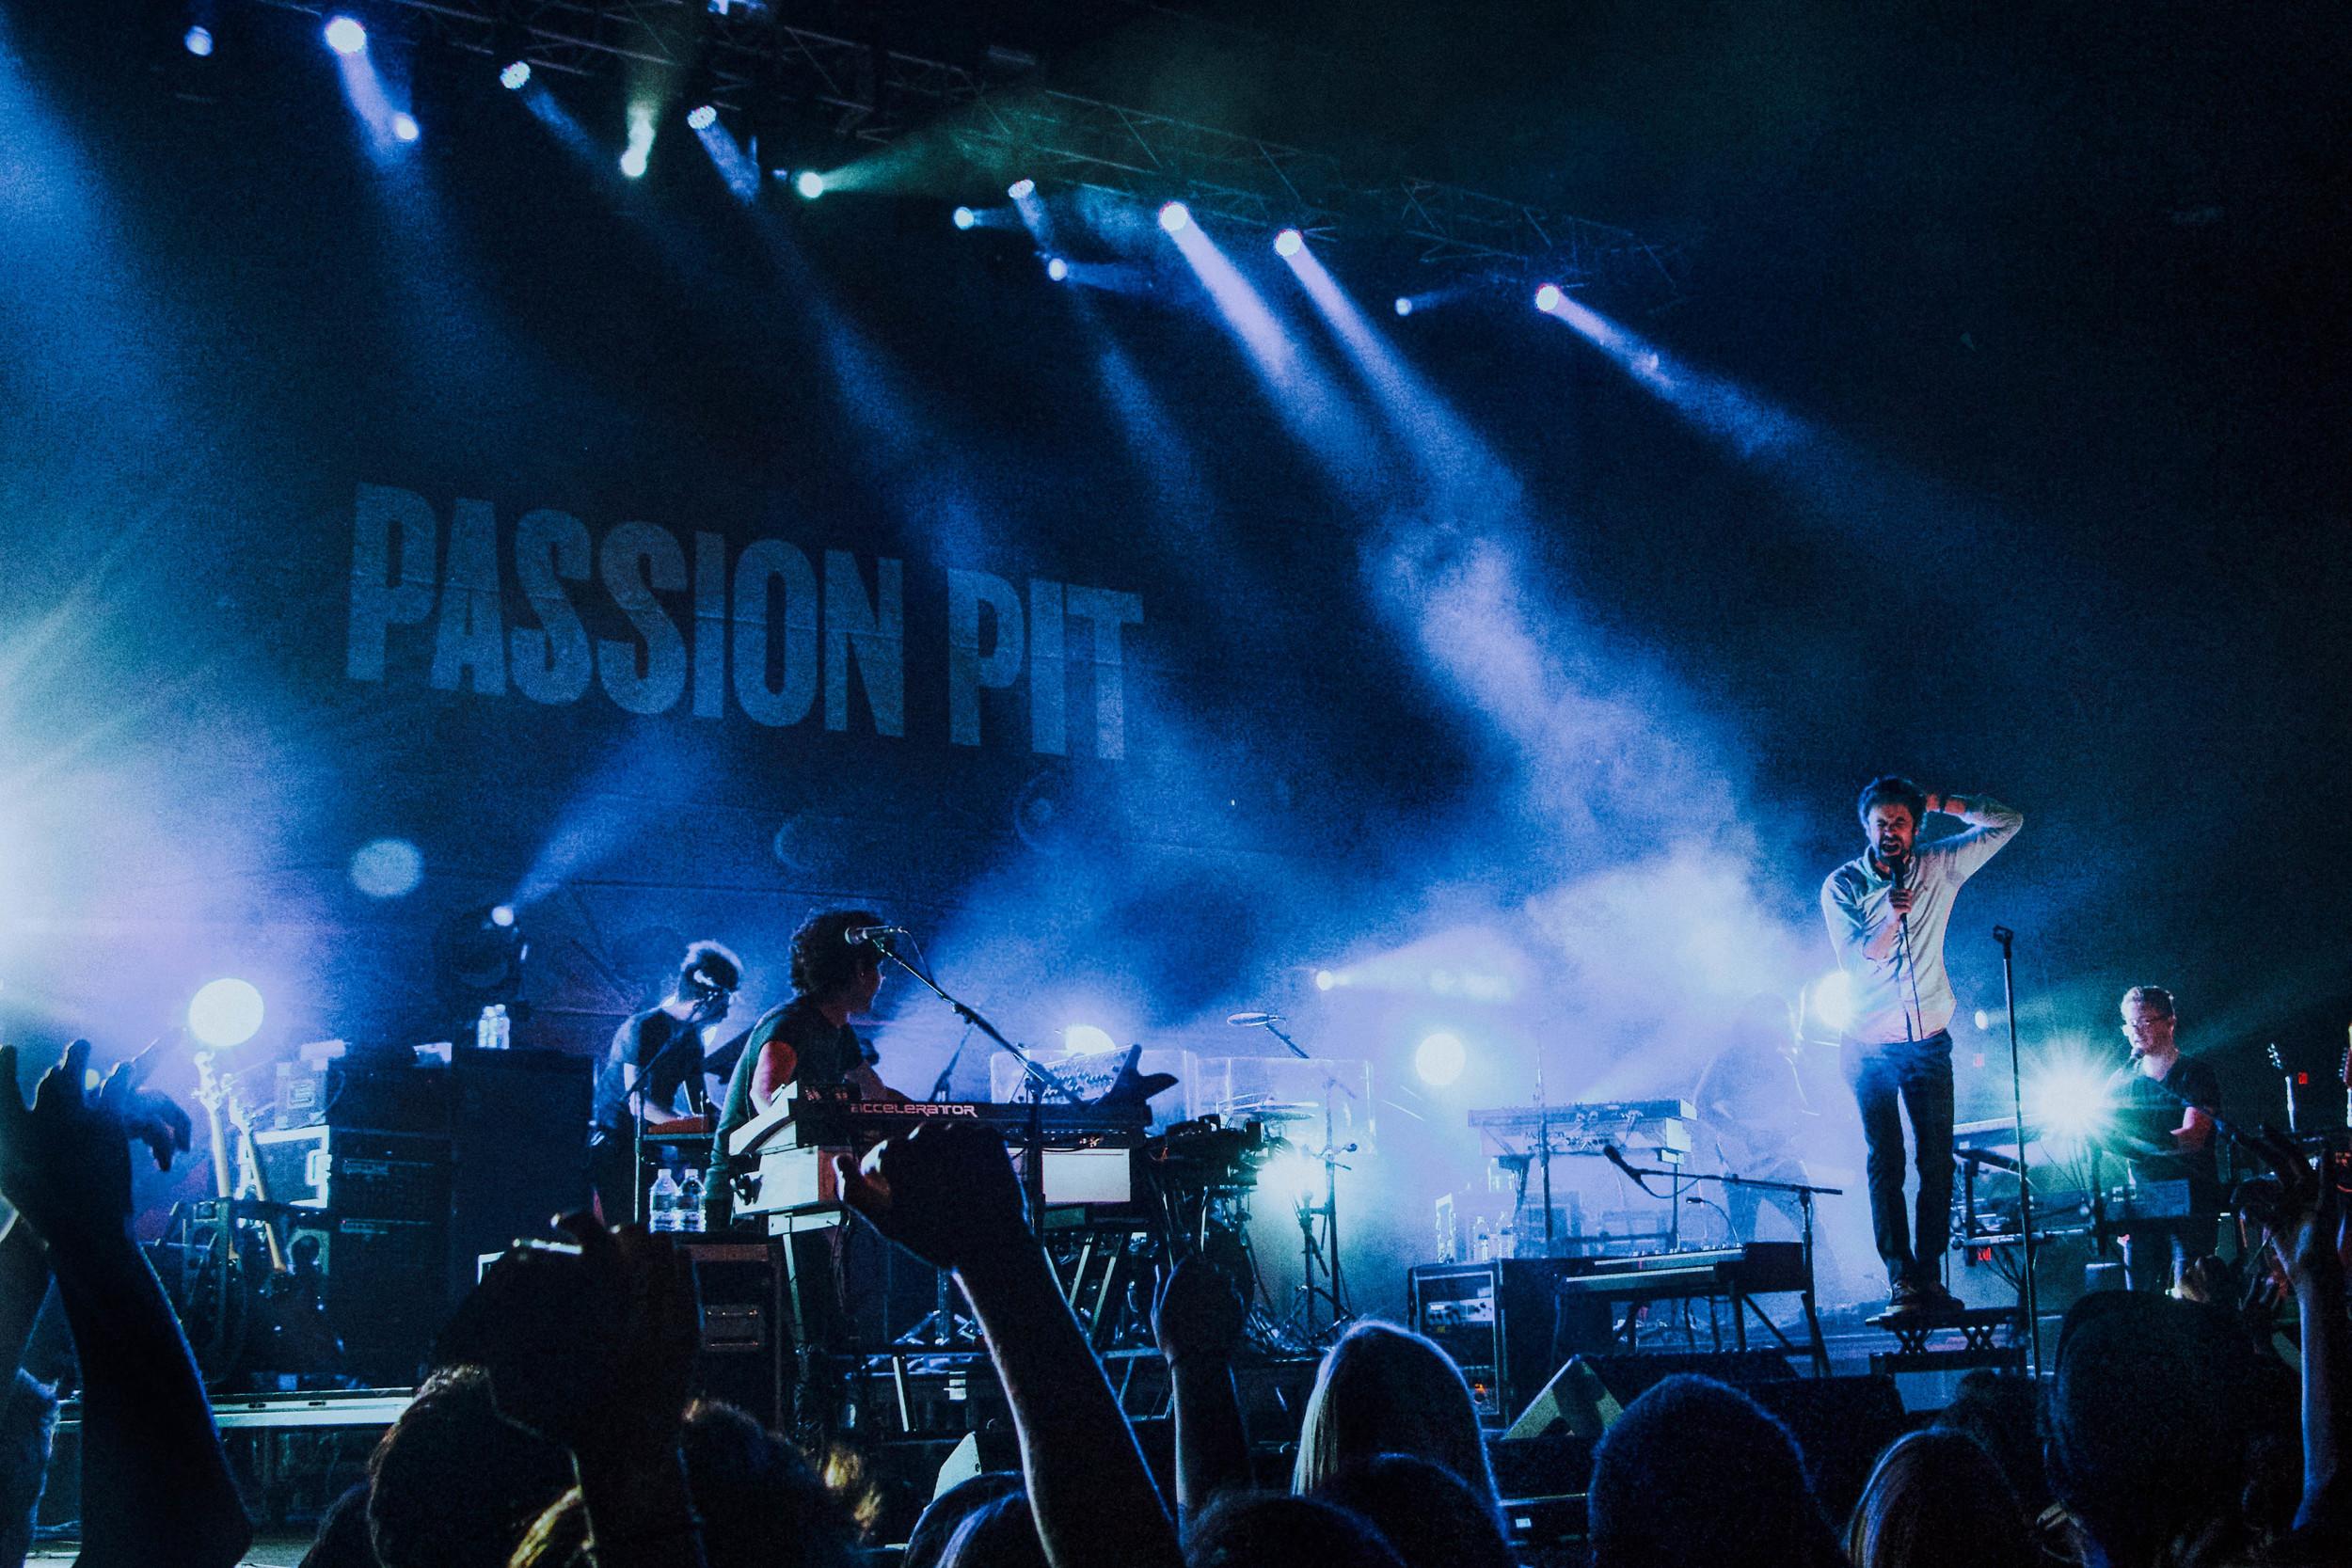 Passion Pitc.jpg